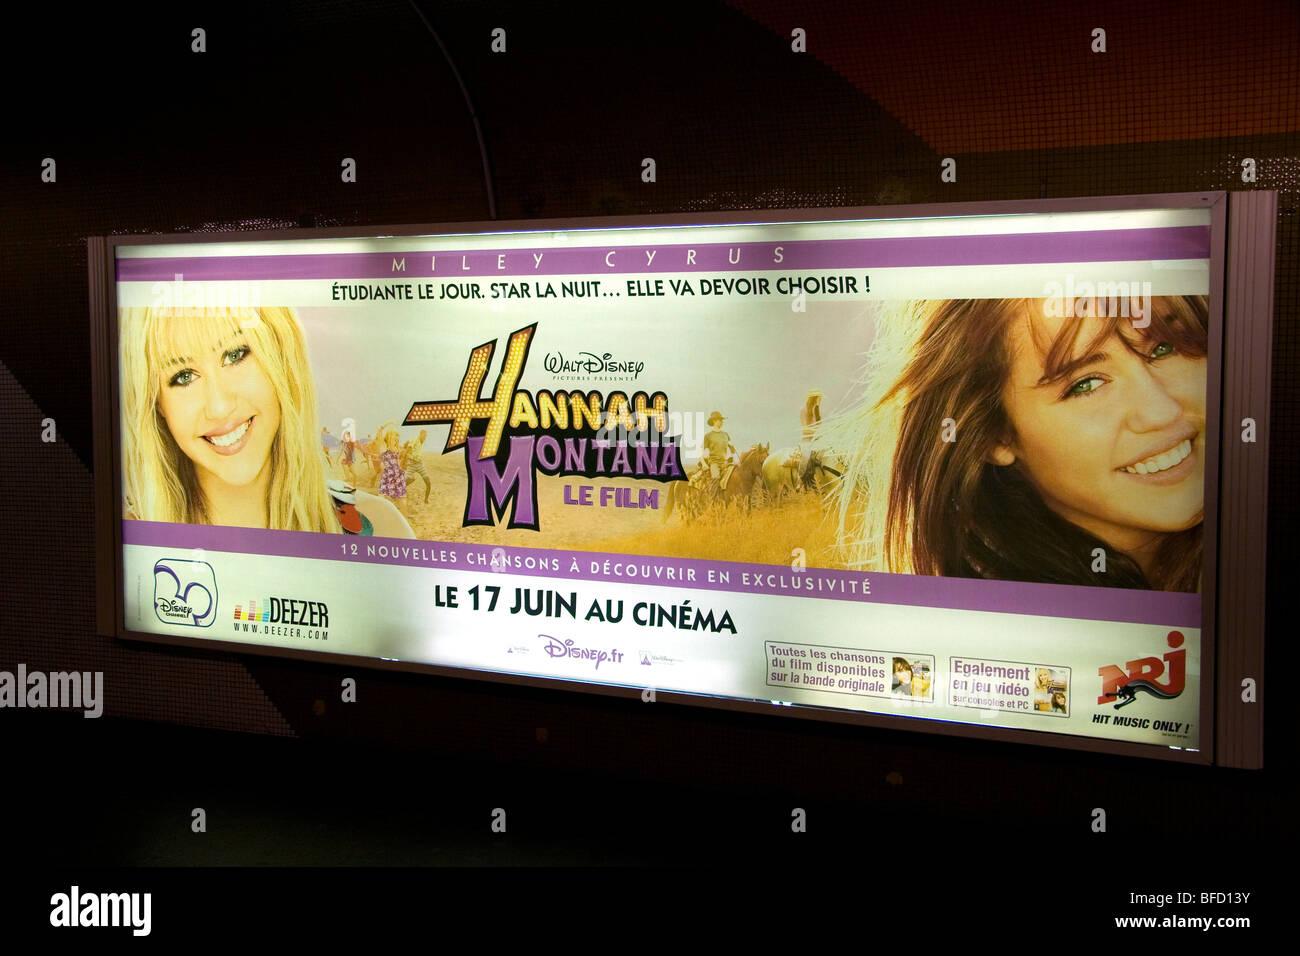 Hannah Montana movie advertisement in the Paris Metro underground, Paris, France. - Stock Image